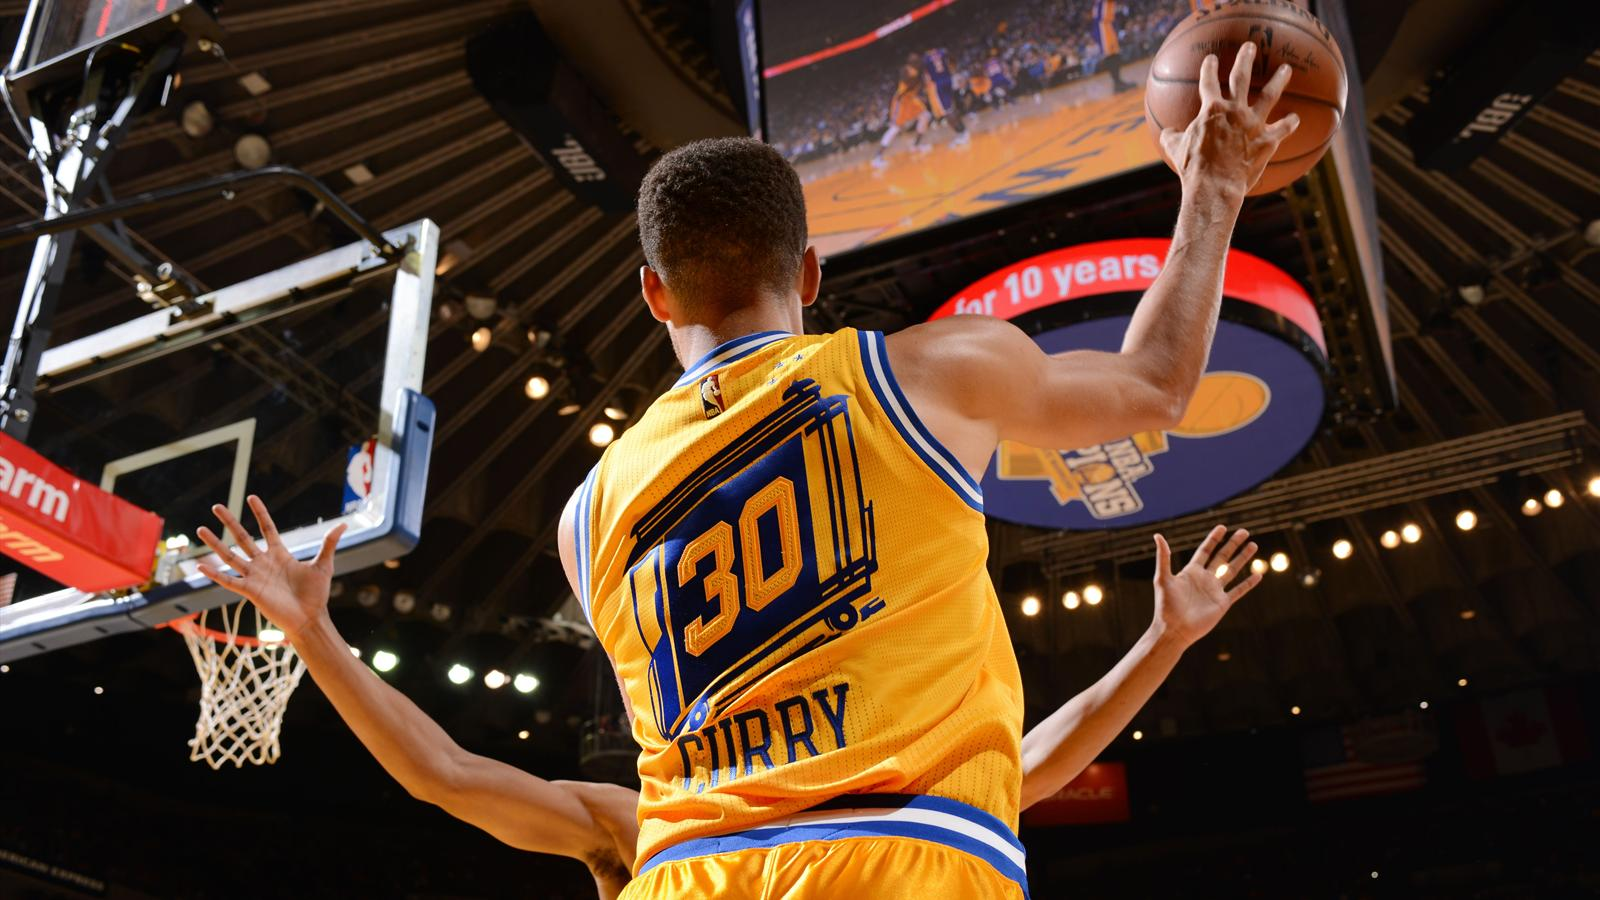 Stephen Curry - Golden State Warrior - NBA 2015